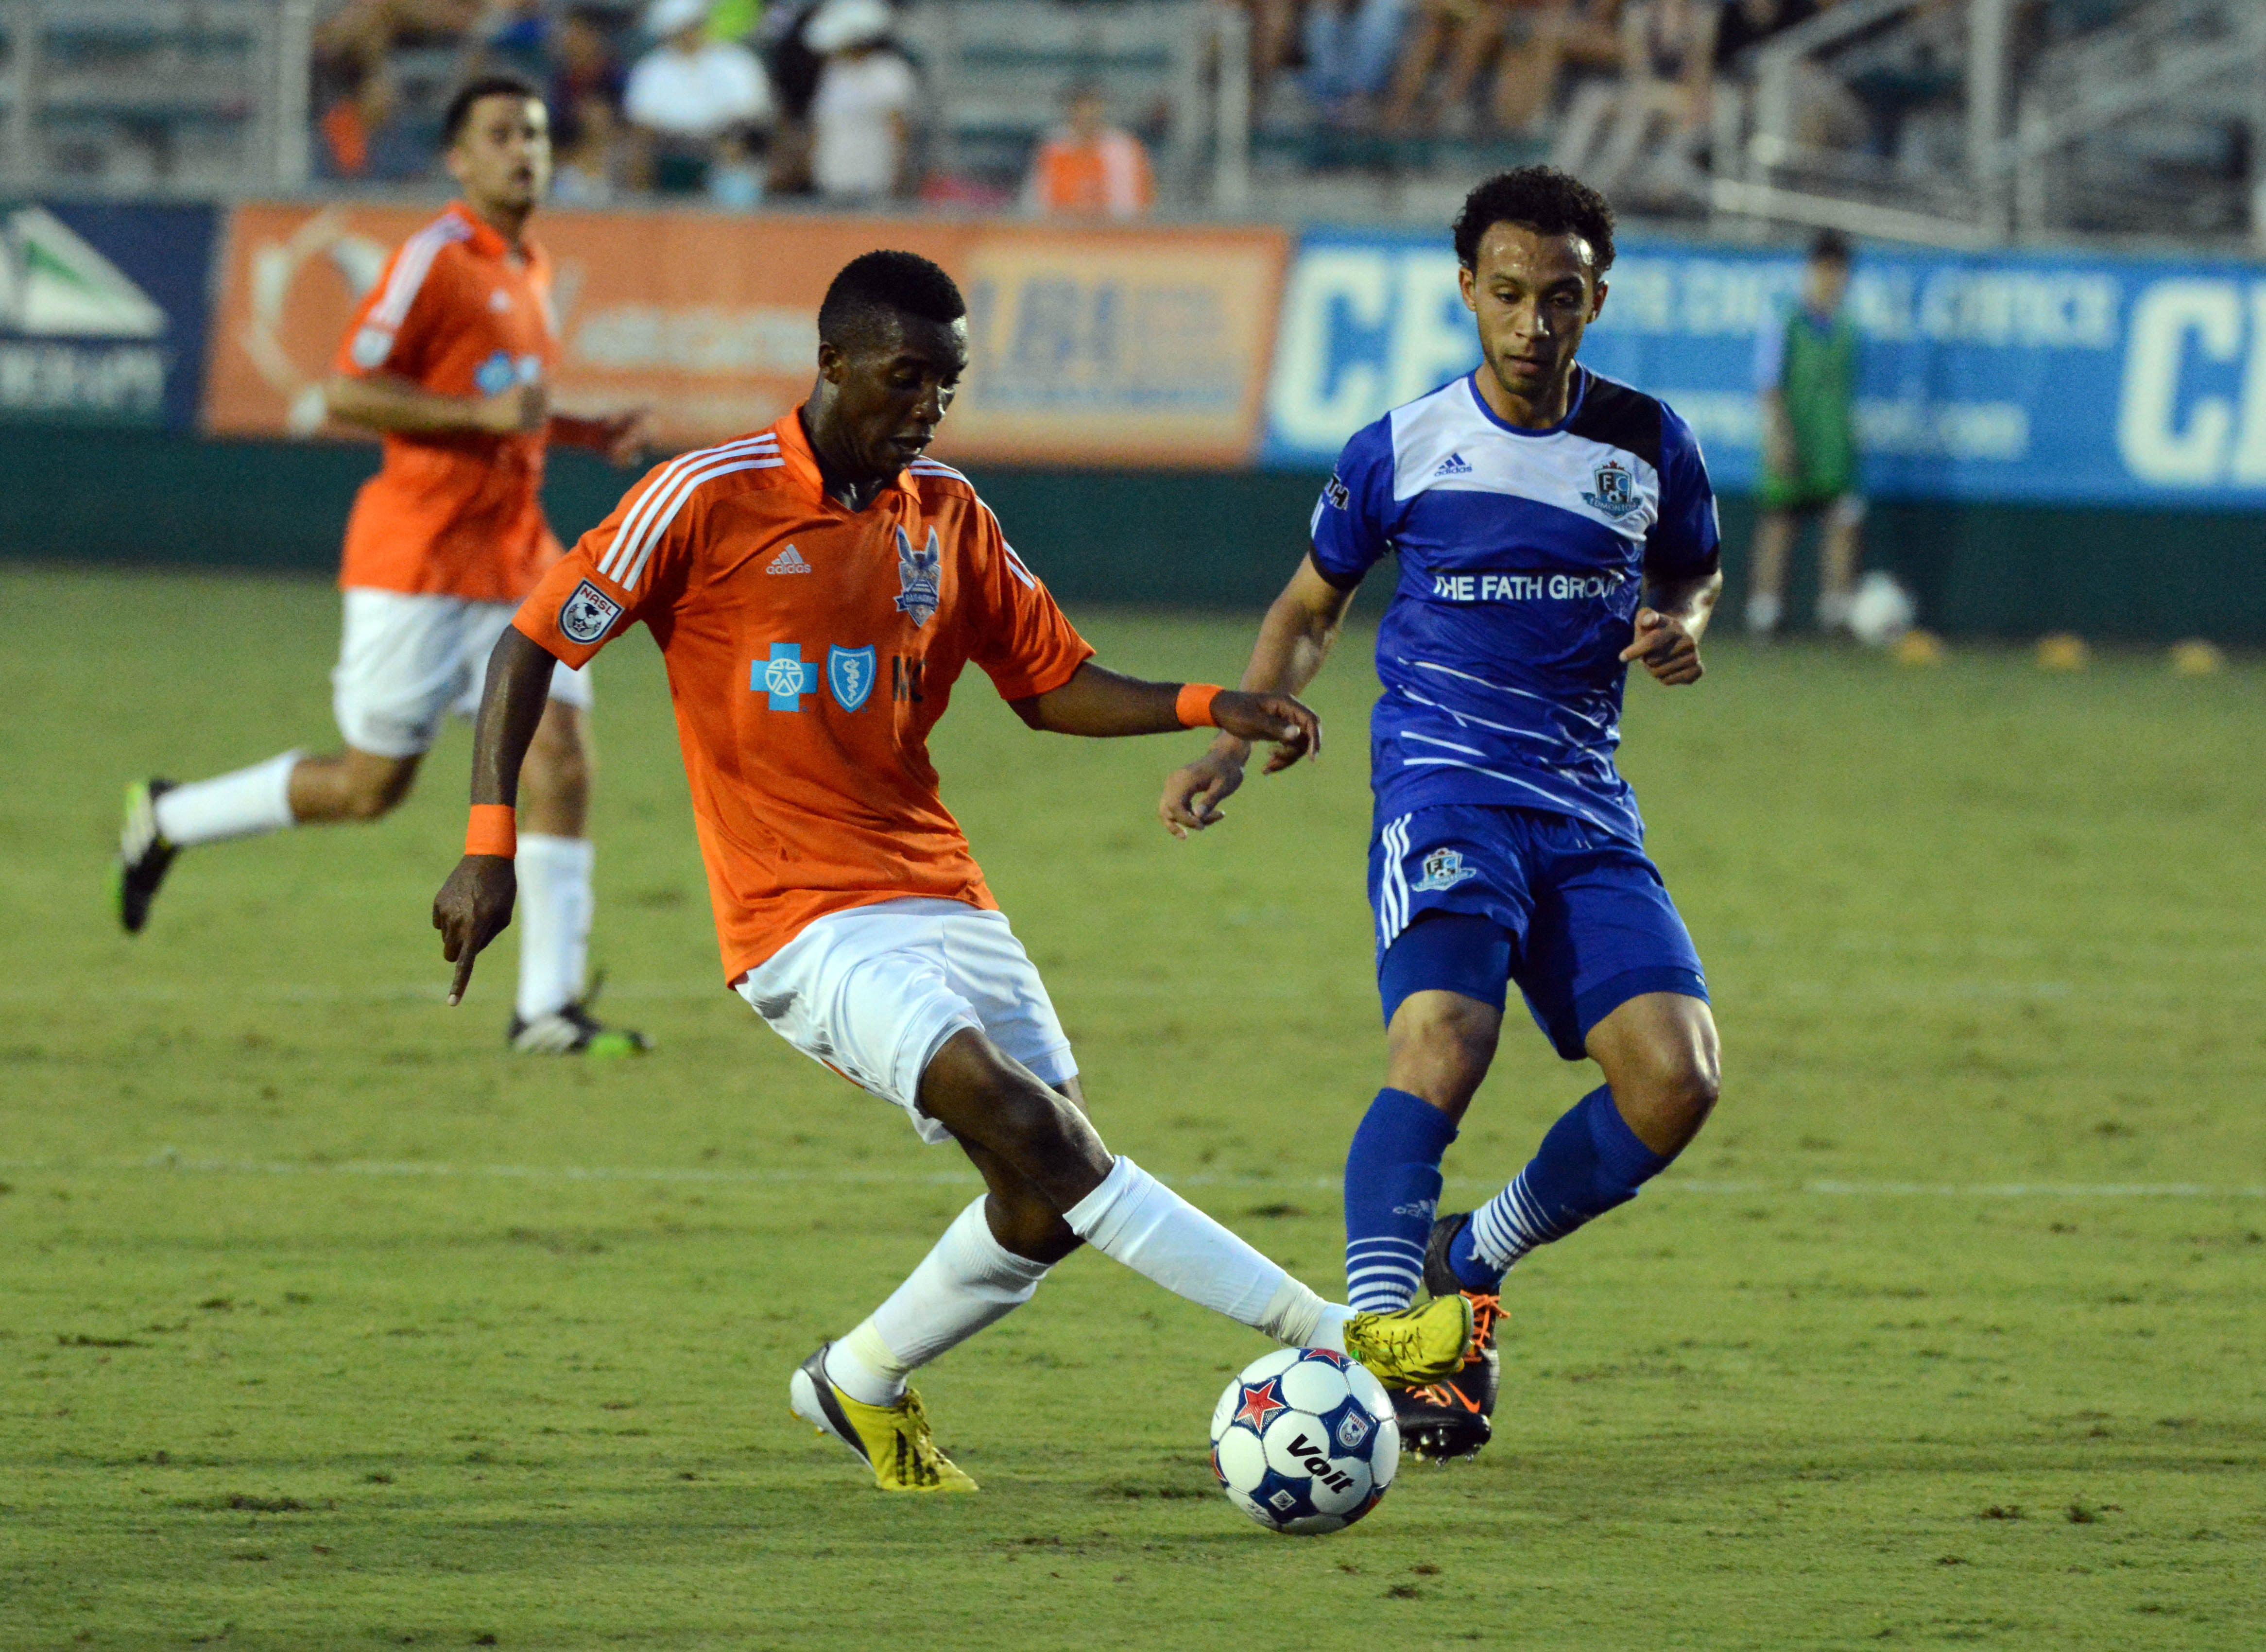 Carolina's Ty Shipalane tries to evade FCE's Cristian Raudales. PHOTO: ROB KINNAN